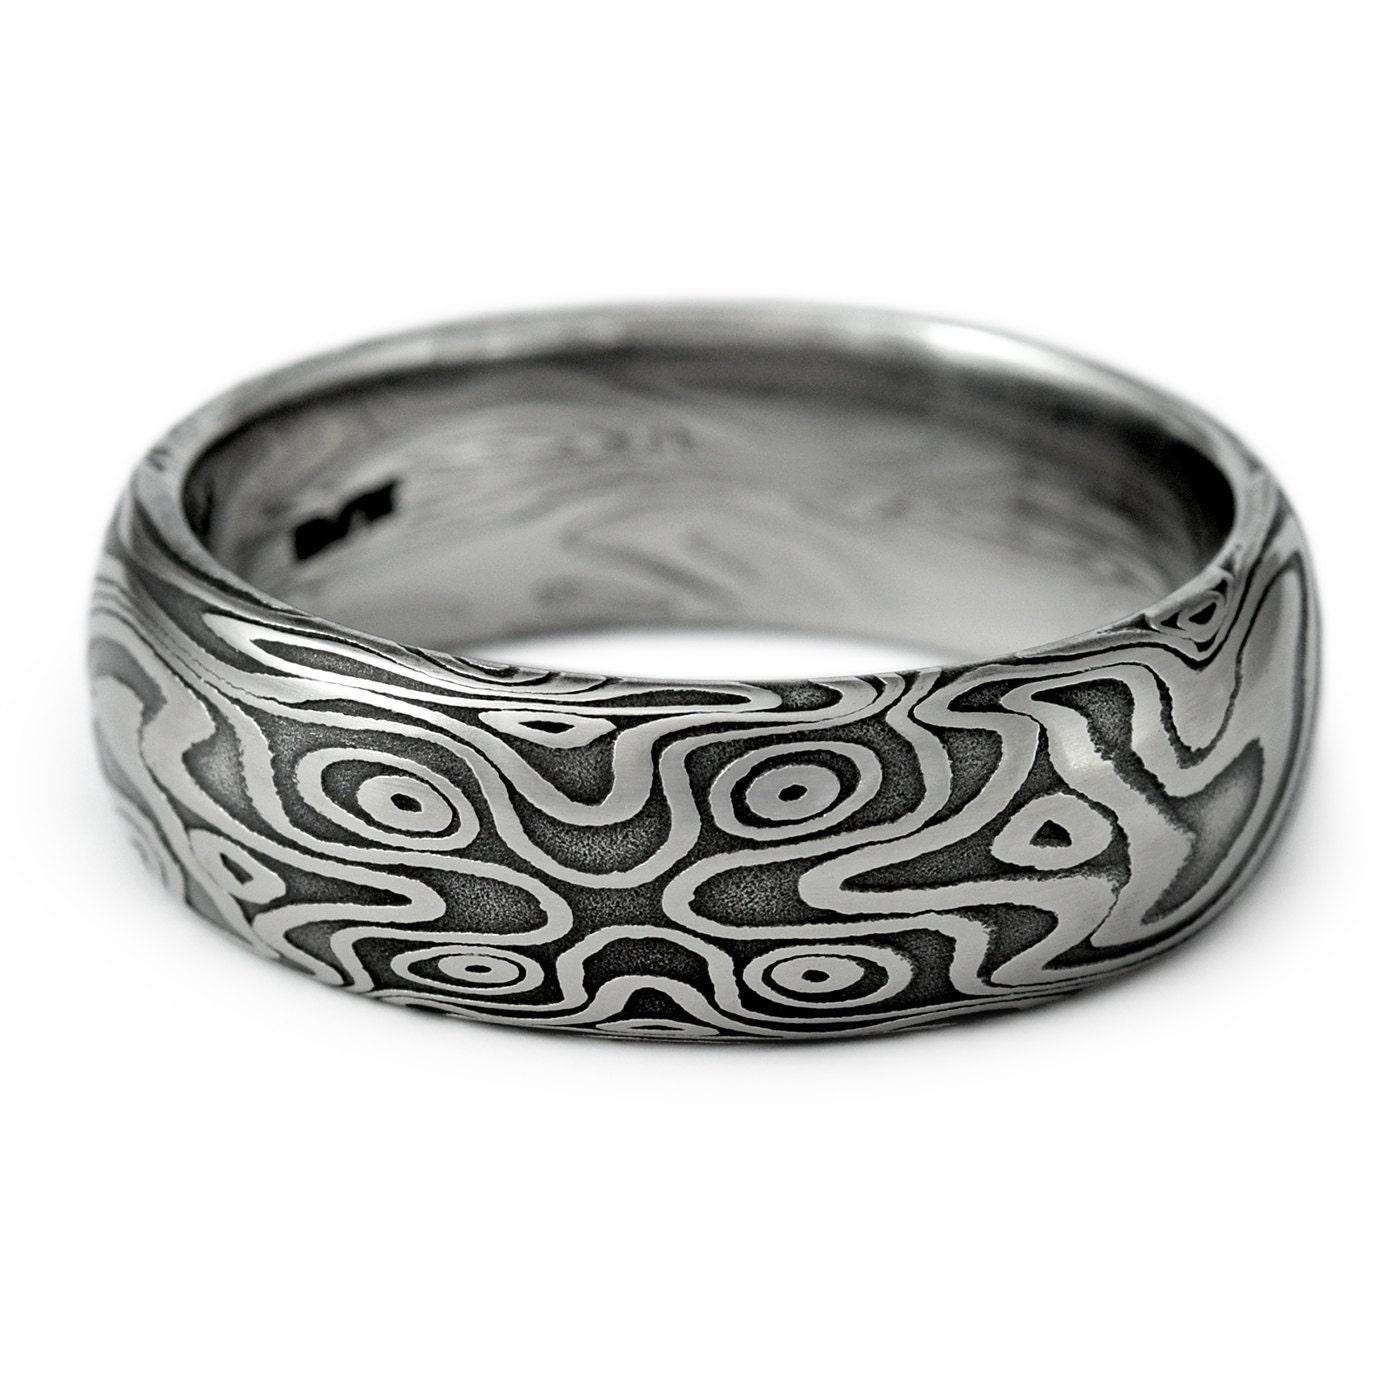 Man S Hand Bands: Wood Grain Ring Damascus Steel Men's Domed Wedding Band